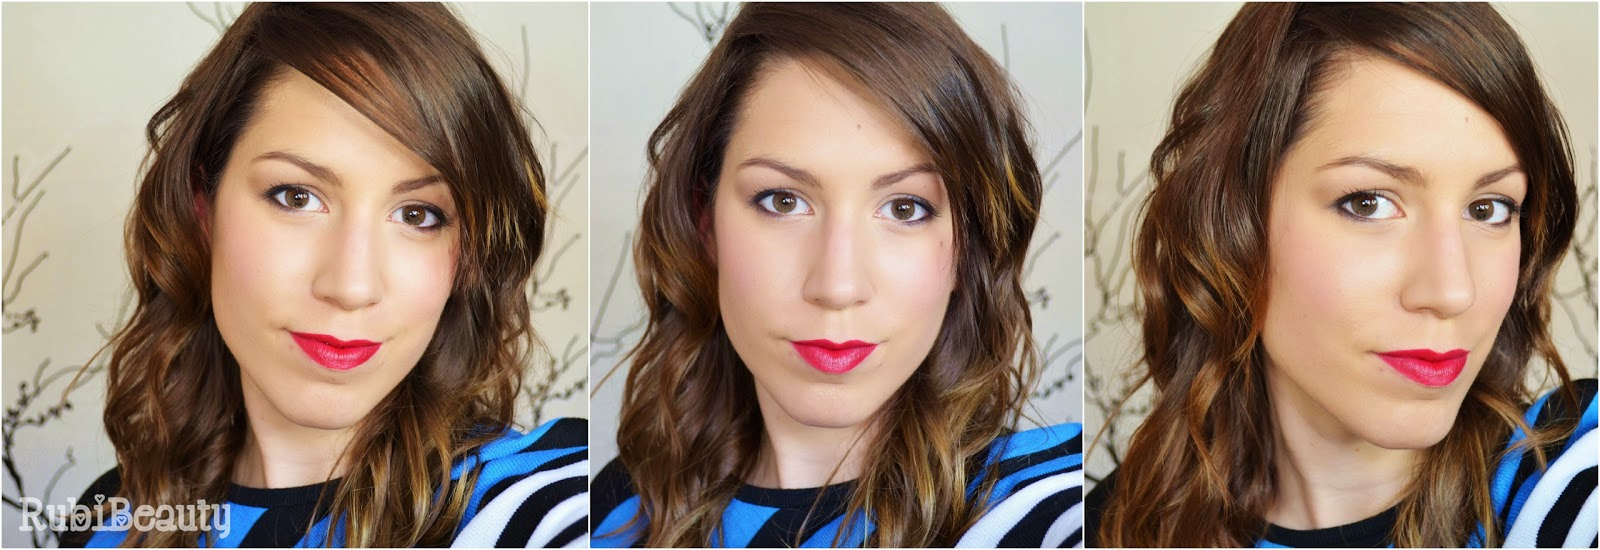 rubibeauty maquillaje emma watson labios rojos